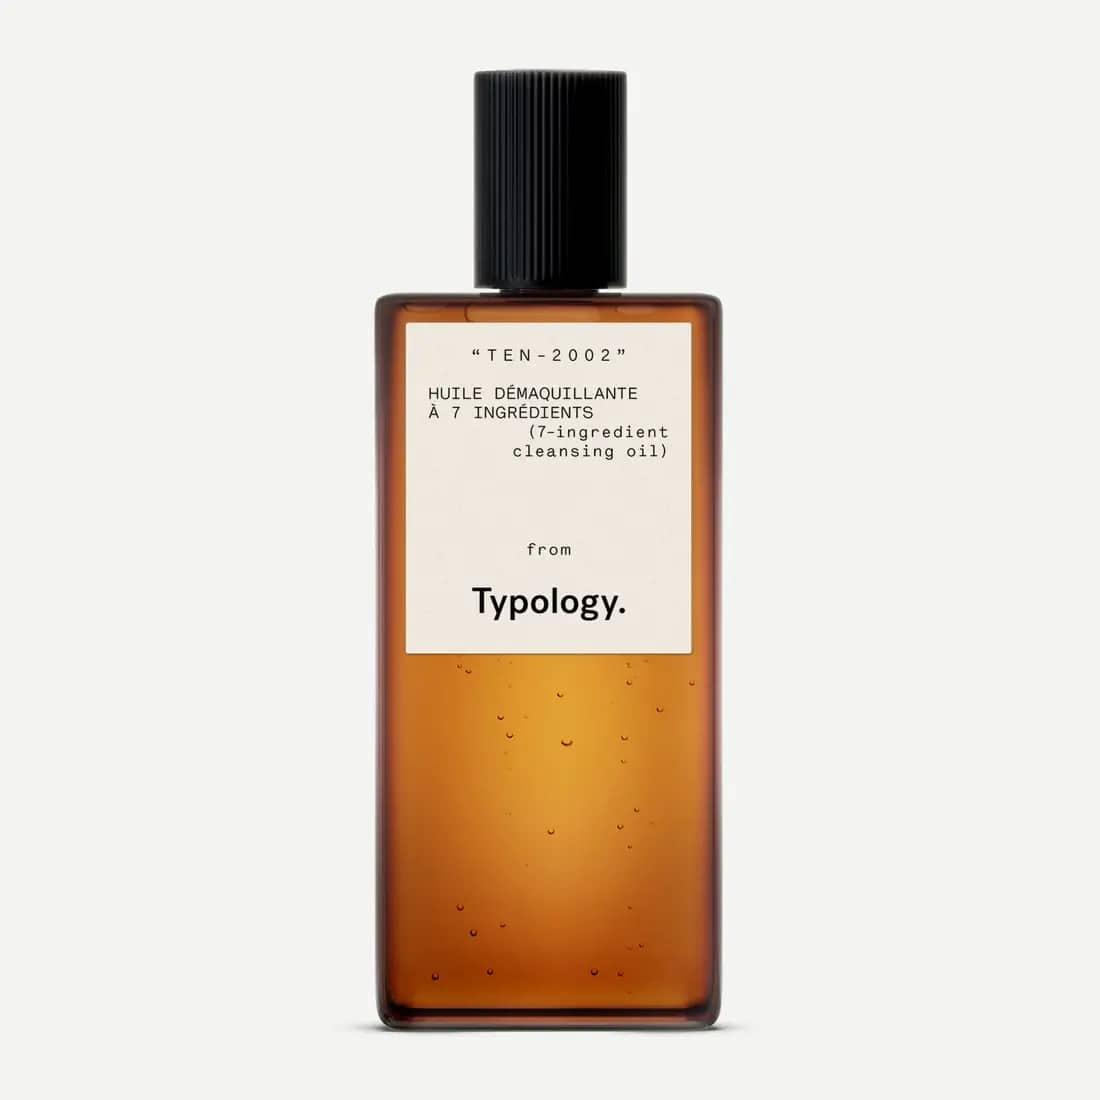 huile démaquillante skin care